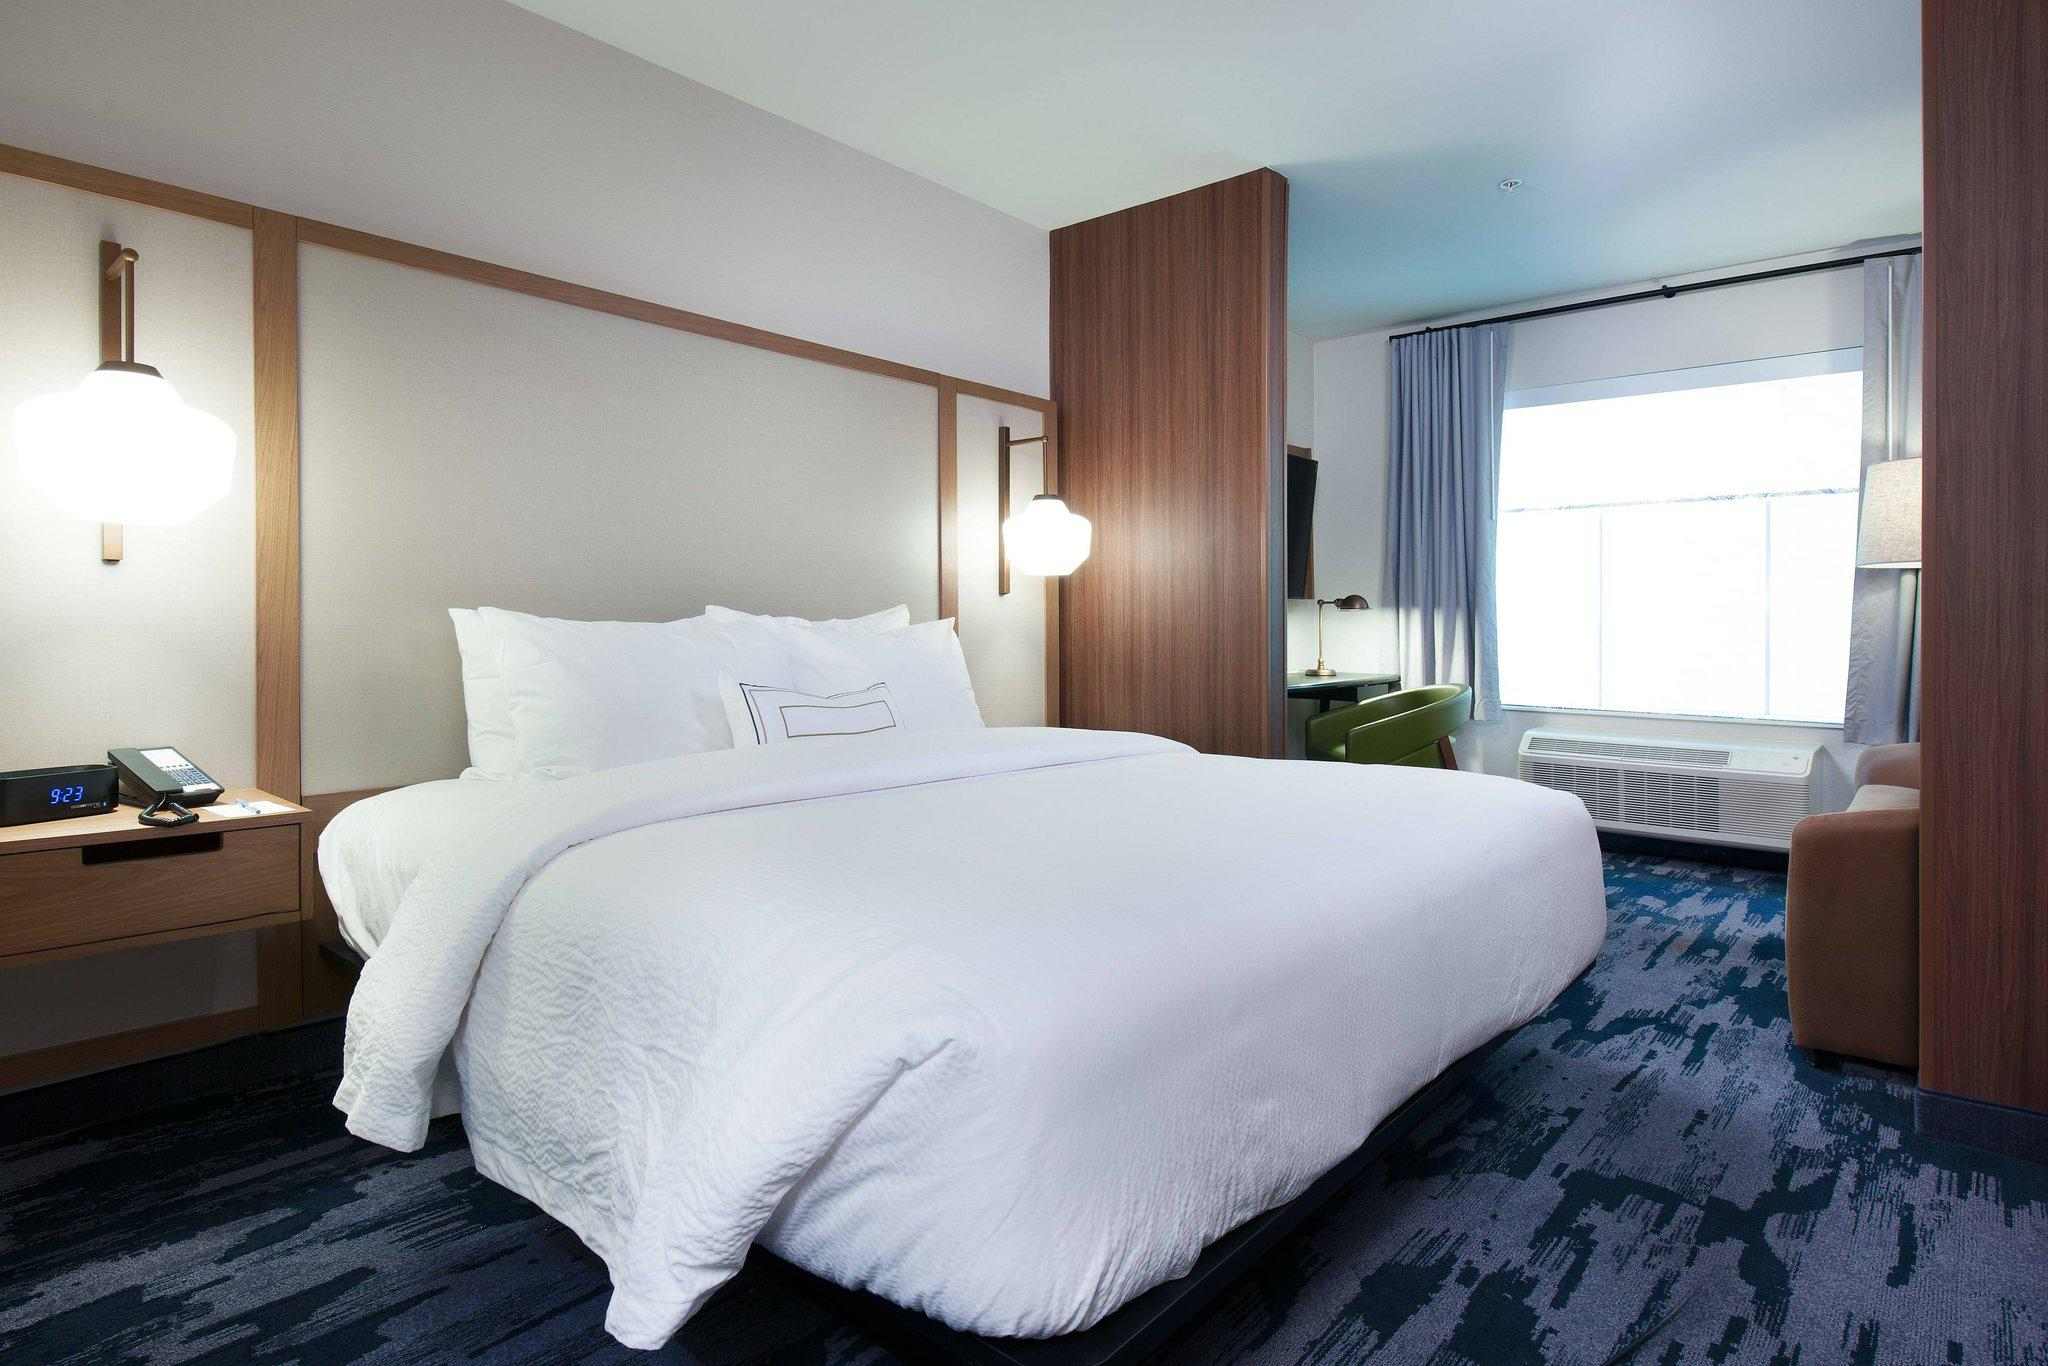 Fairfield Inn & Suites by Marriott Pittsburgh Downtown